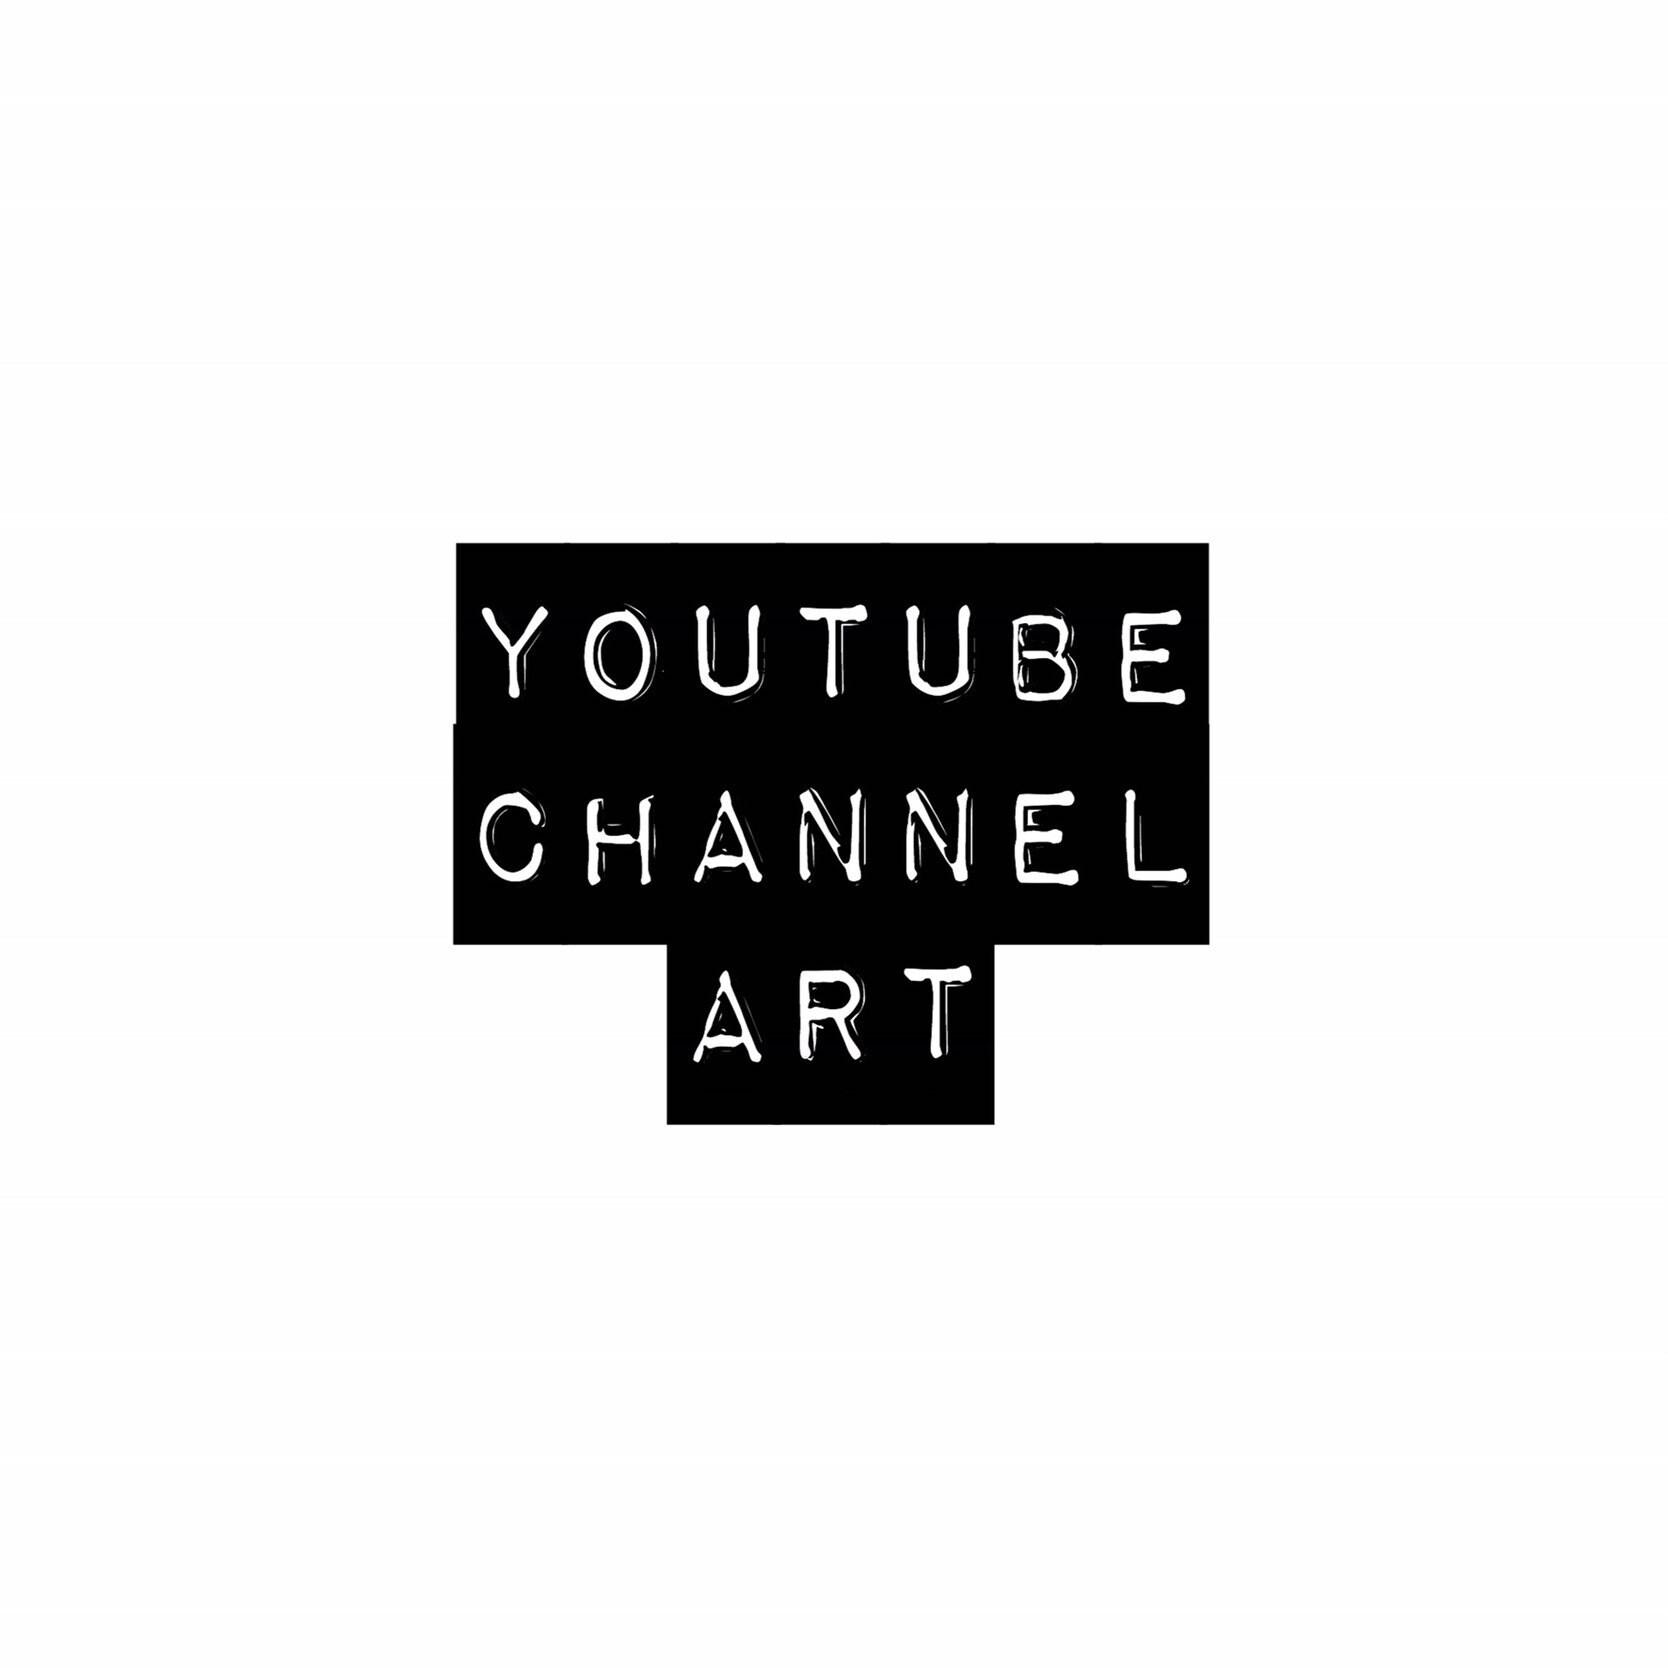 Benutzerdefinierte Youtube-Banner / Kanal Kunst